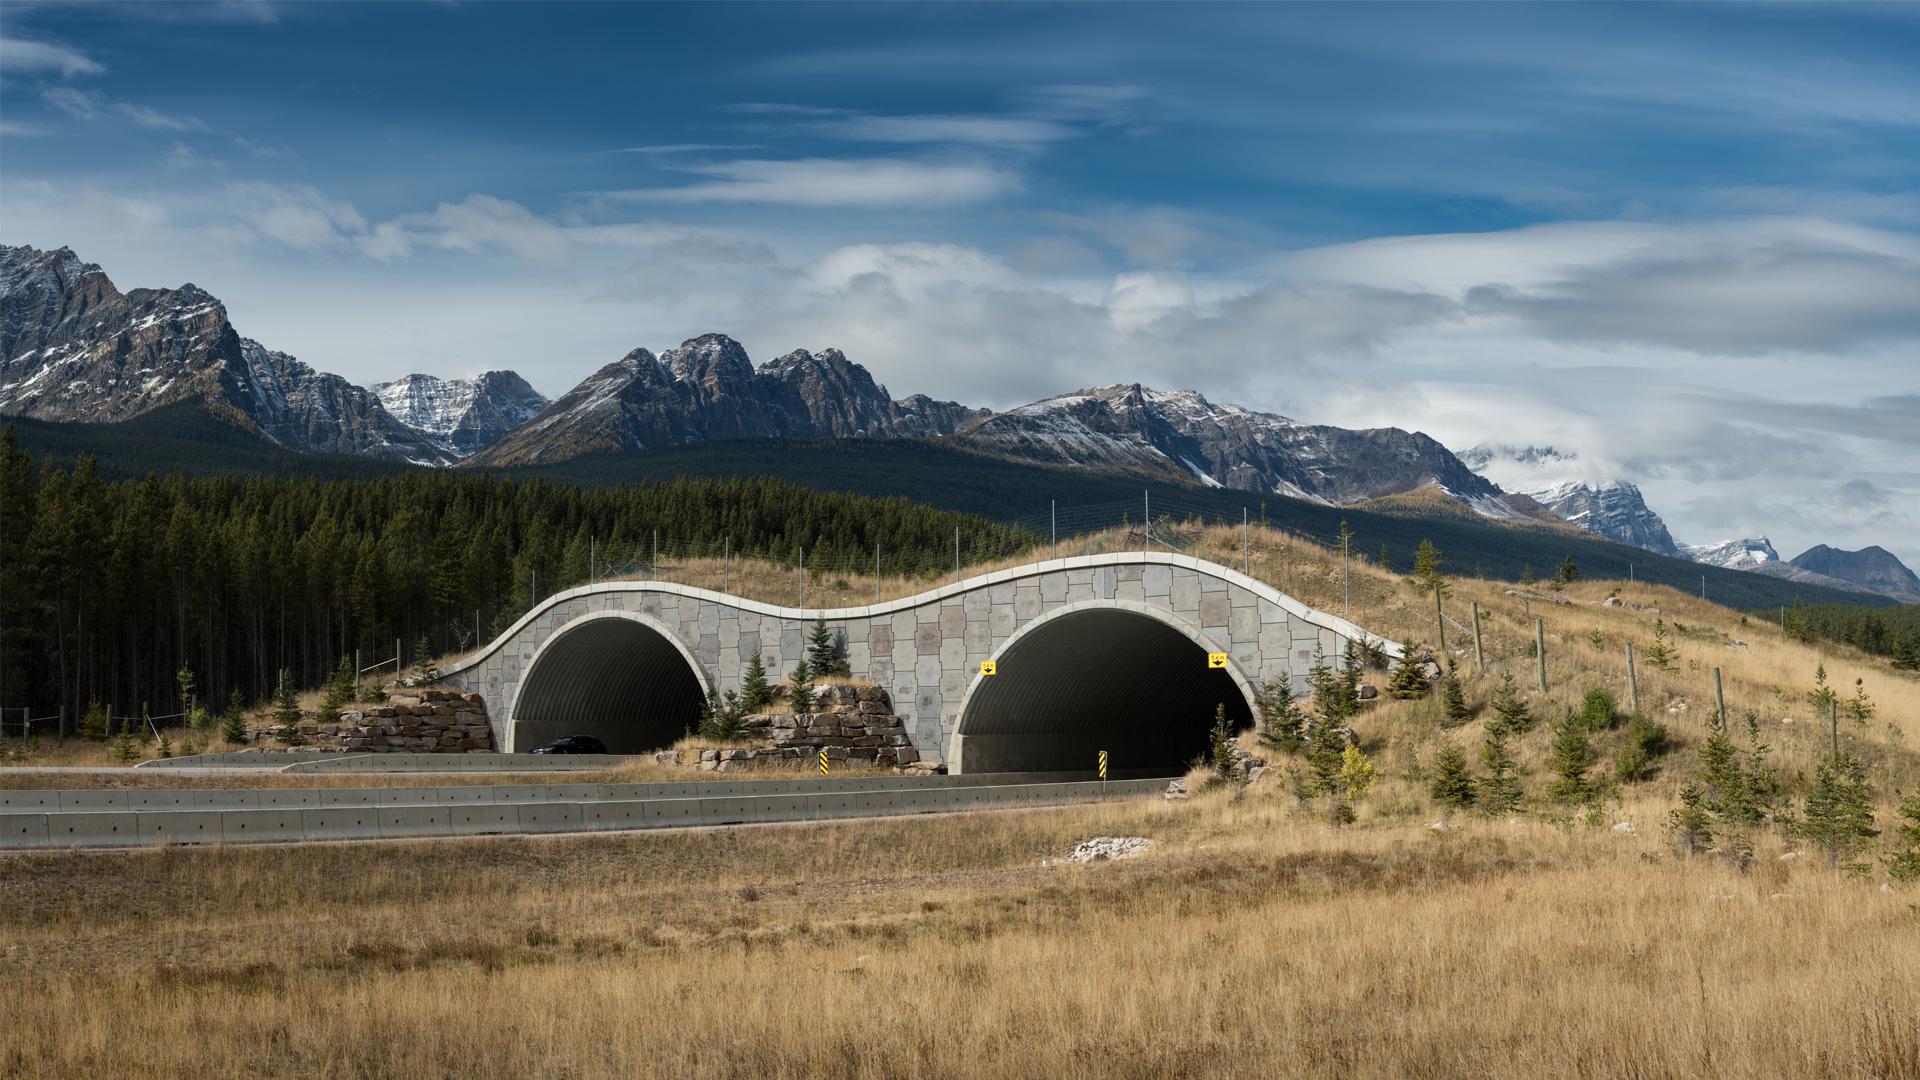 Wildlife Bridge picture from Steve Gadomski